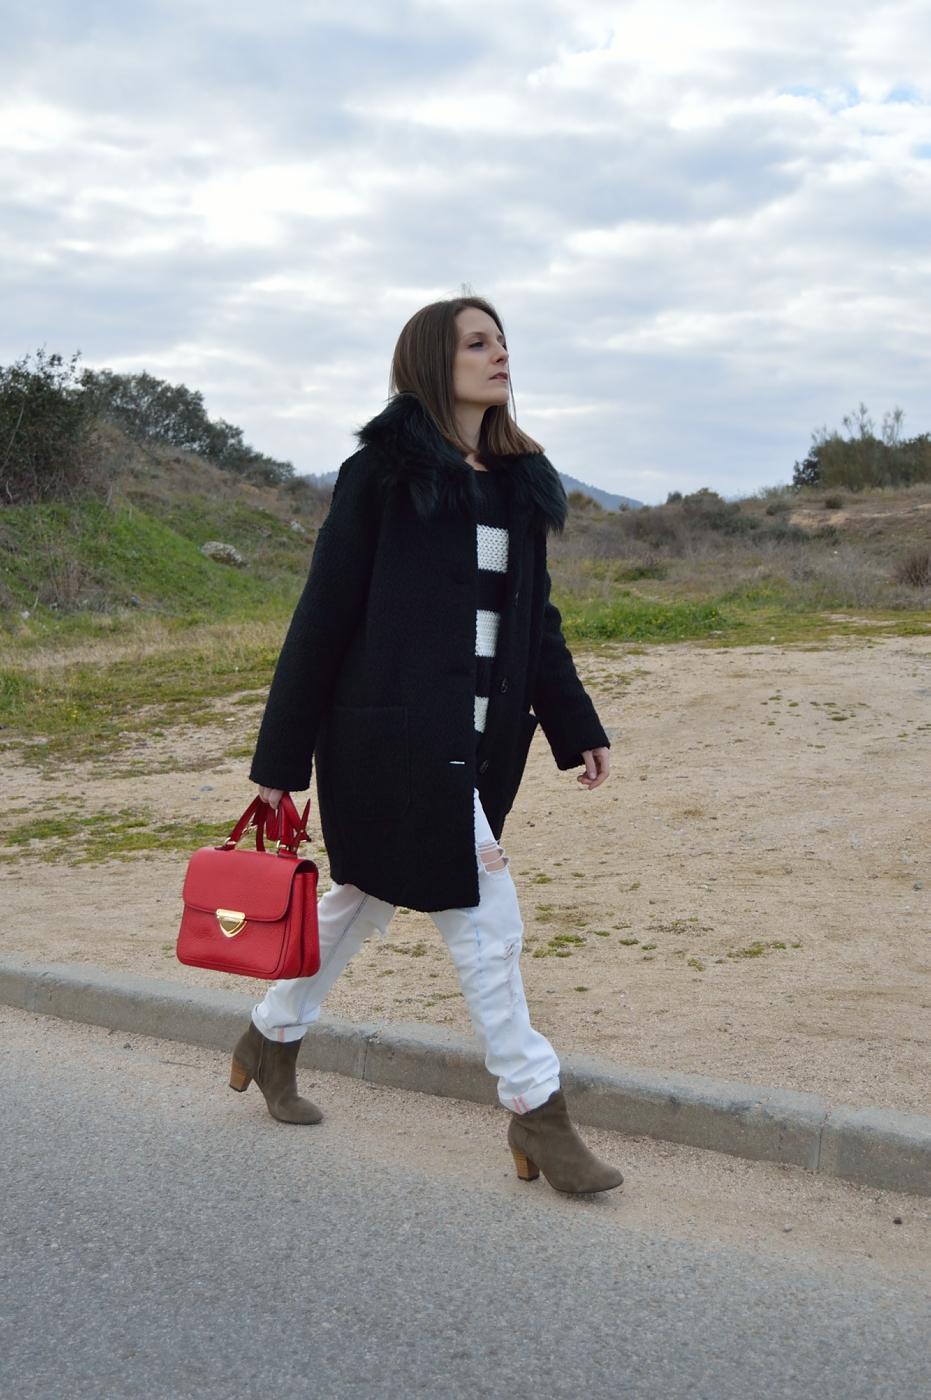 lara-vazquez-mad-lula-style-streetstyle-chic-look